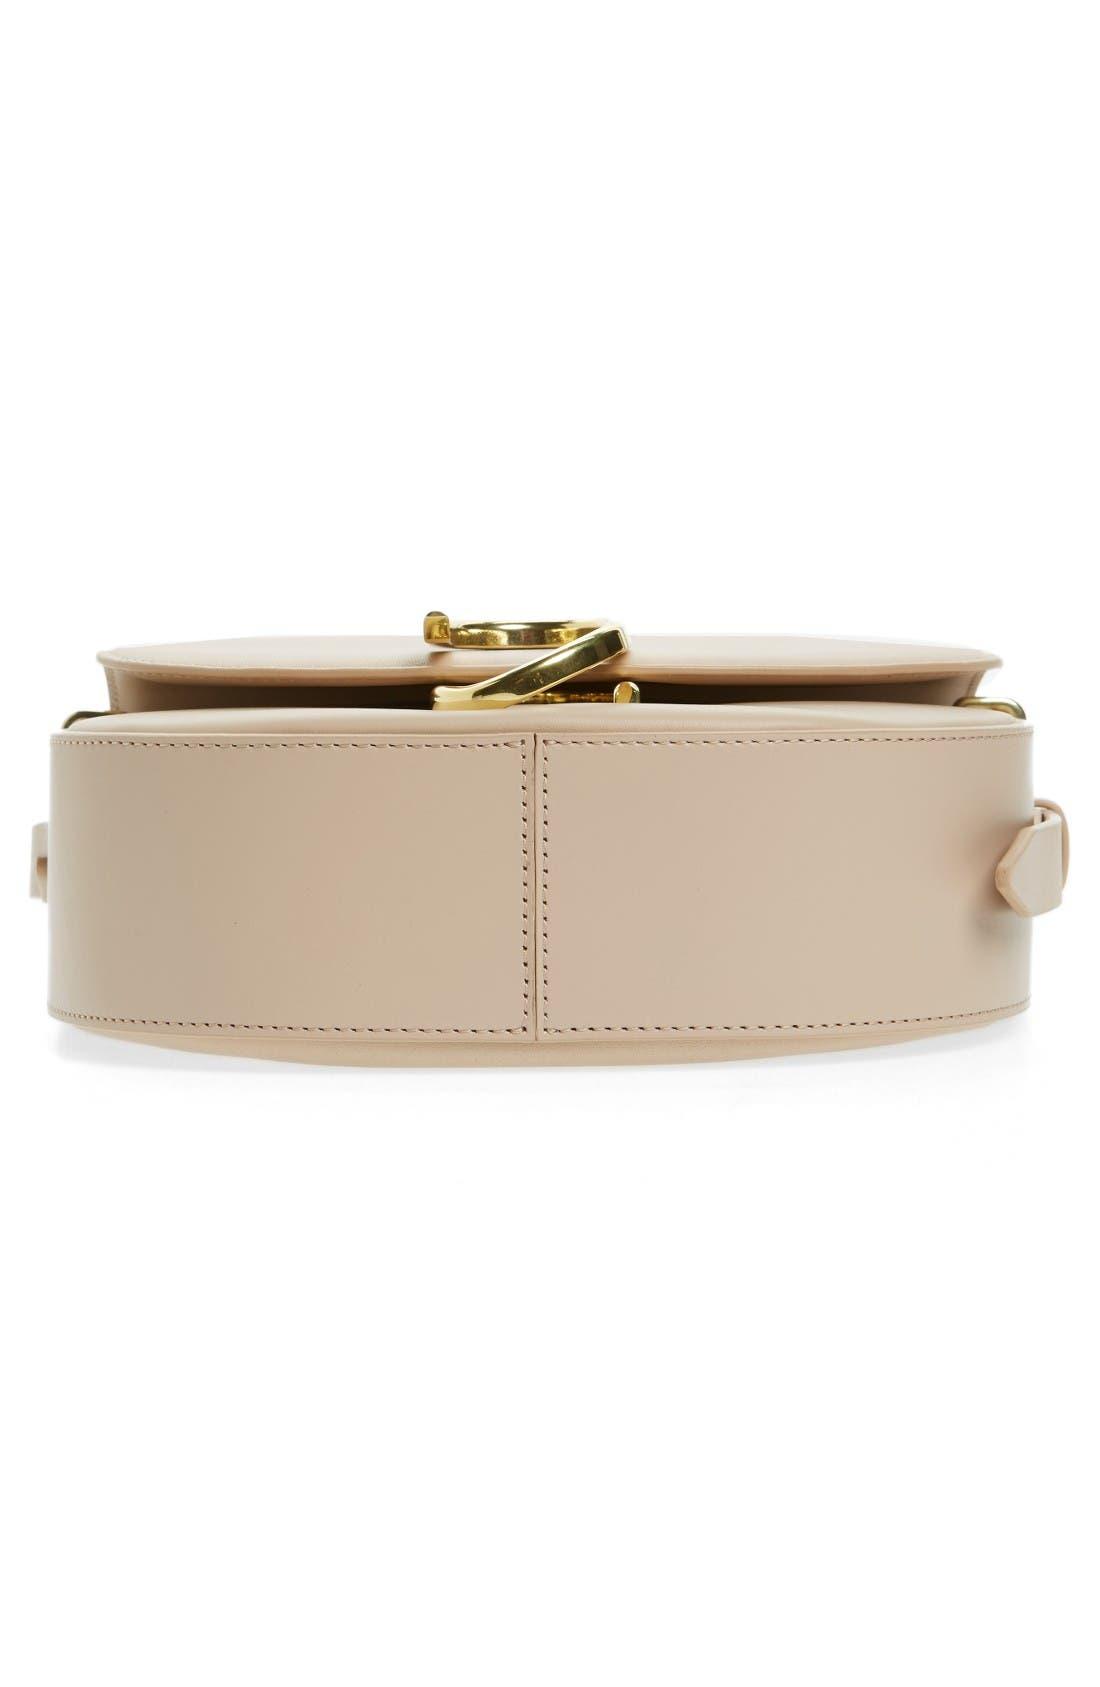 Alix Leather Saddle Bag,                             Alternate thumbnail 5, color,                             Cashew/ Gold